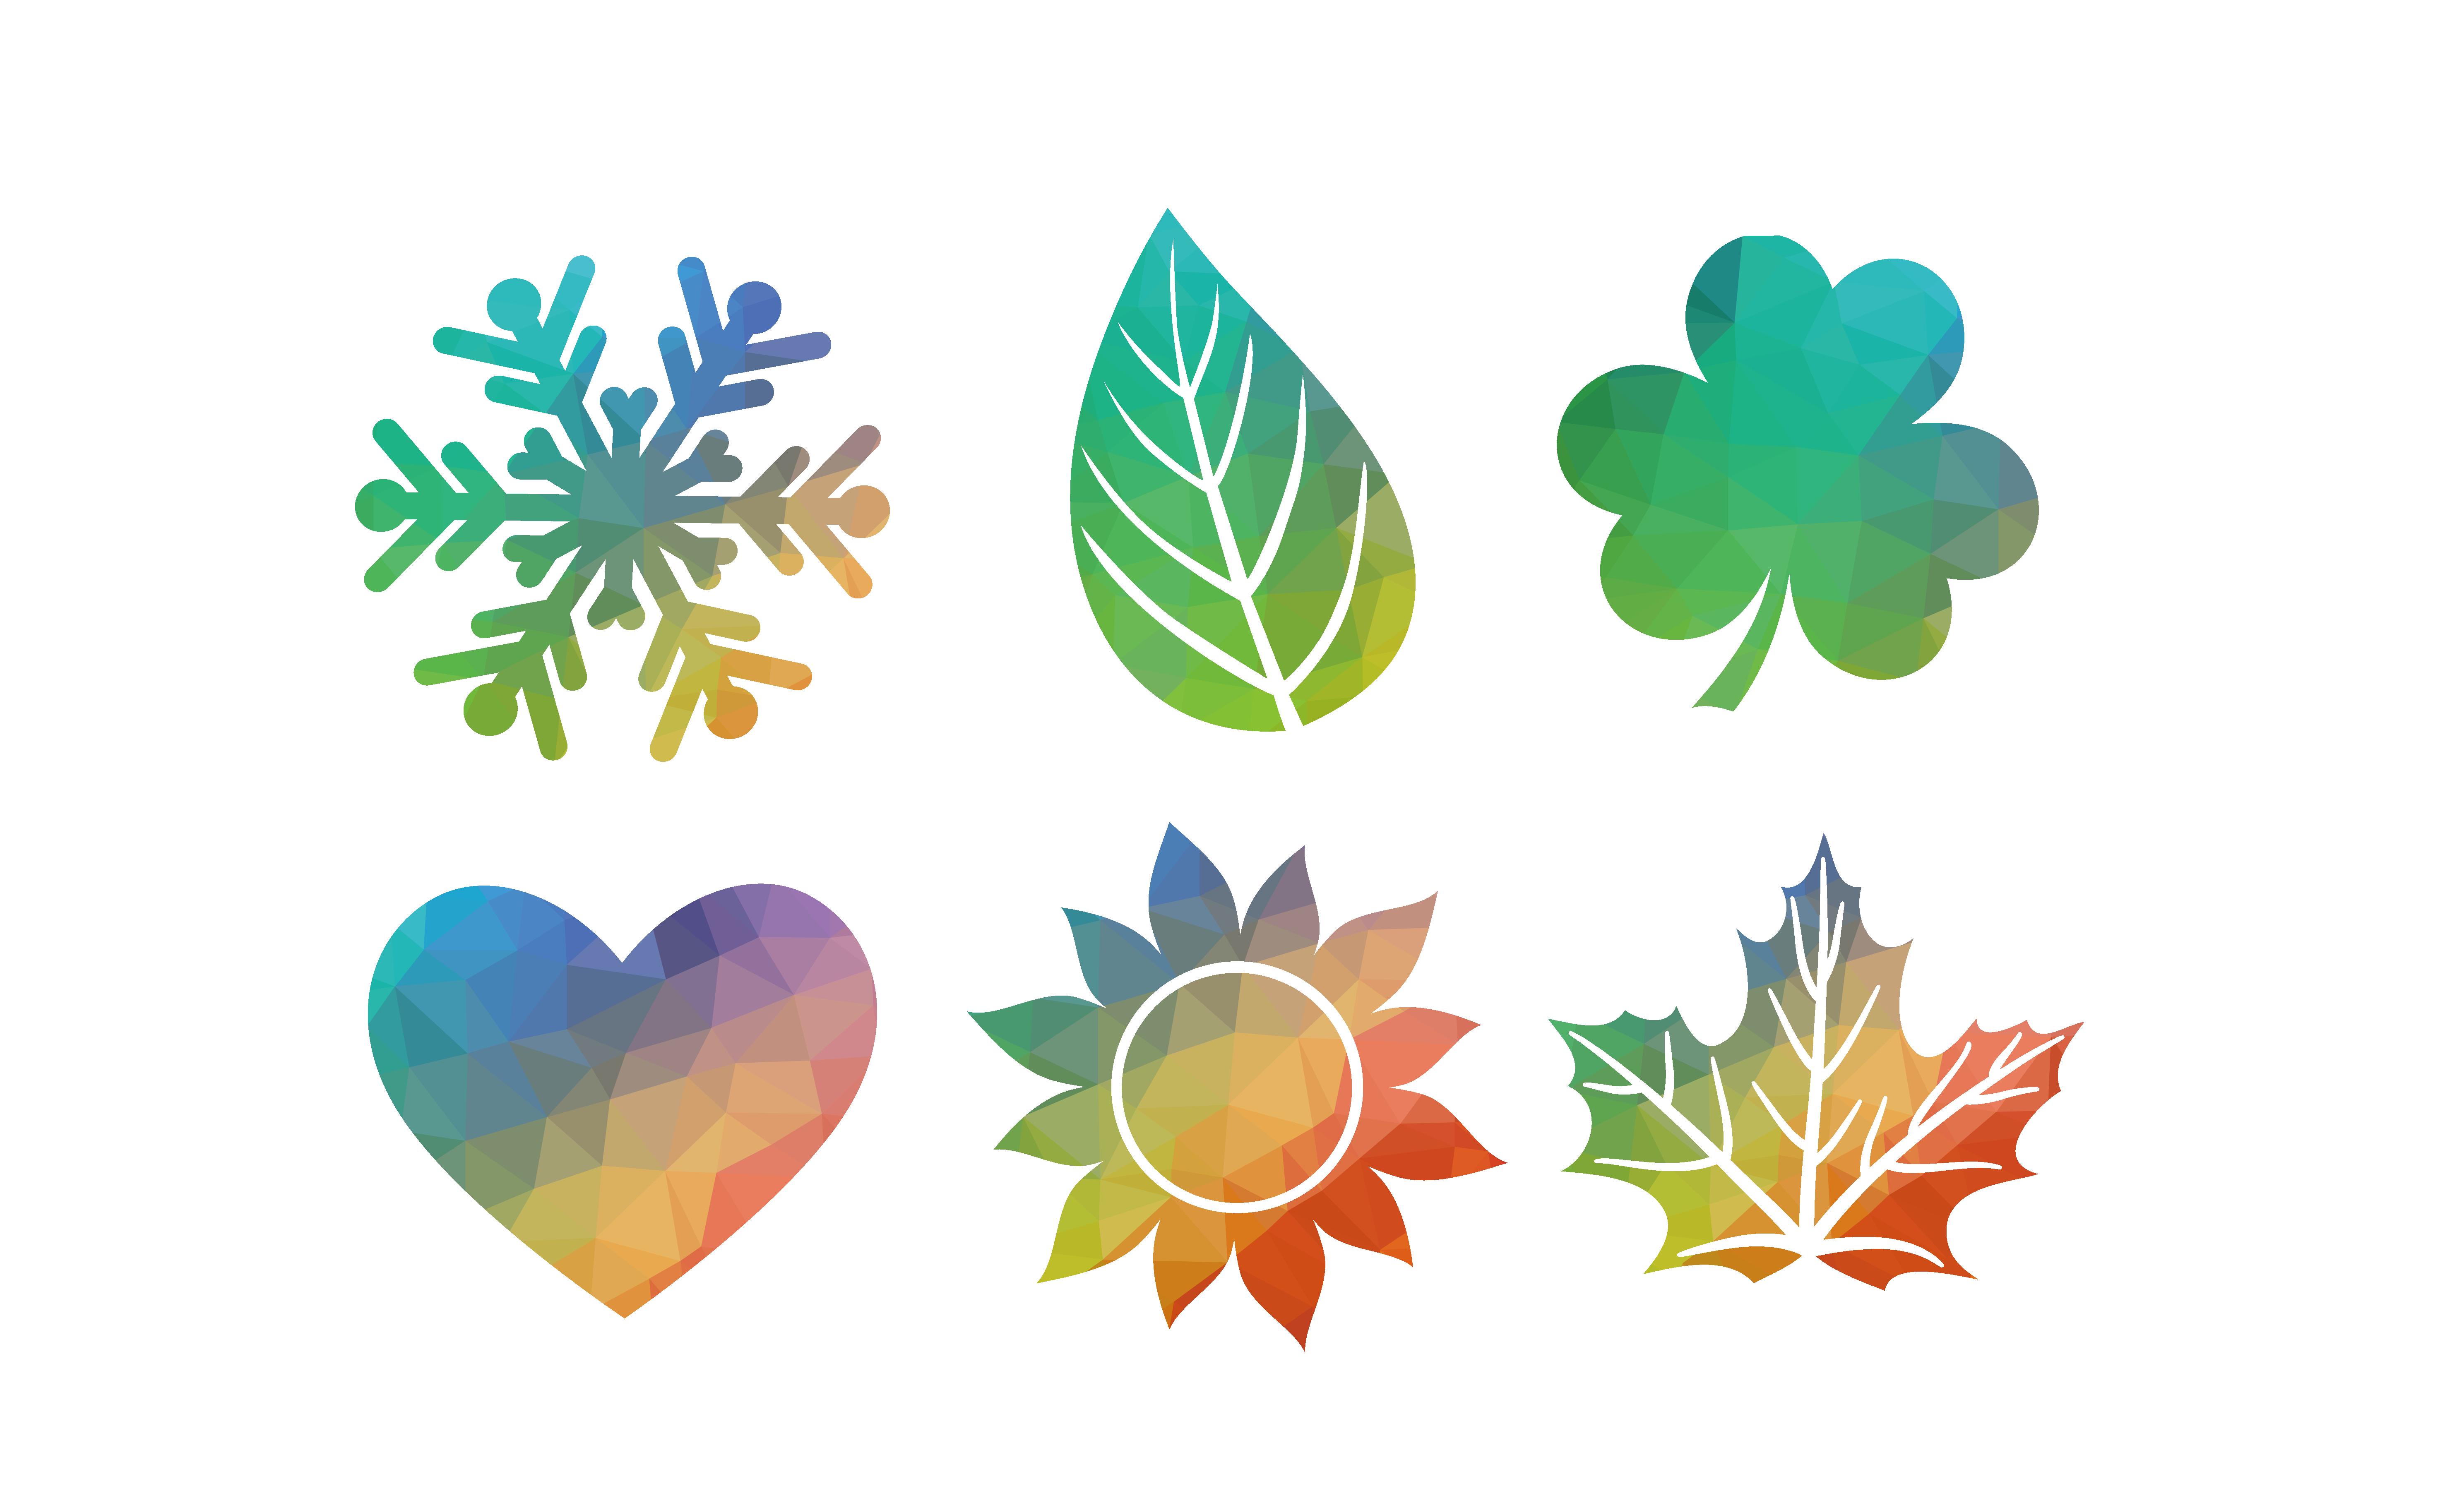 Snowflake colored clipart jpg freeuse download Adobe Illustrator Illustration - Creative color snowflake pattern ... jpg freeuse download